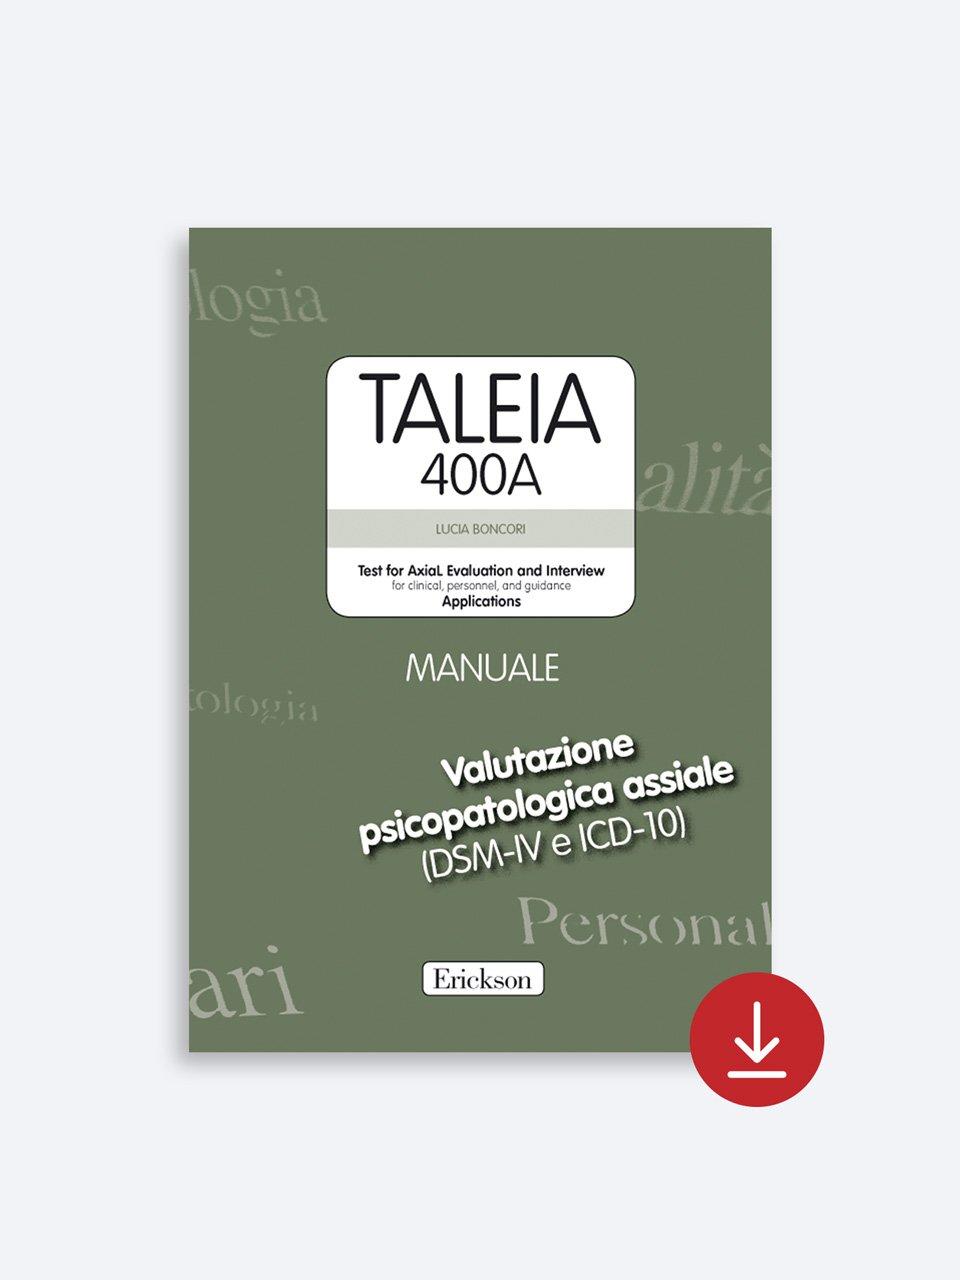 TALEIA-400A - Test for Axial Evaluation and Interv - Libri - App e software - Strumenti - Erickson 4